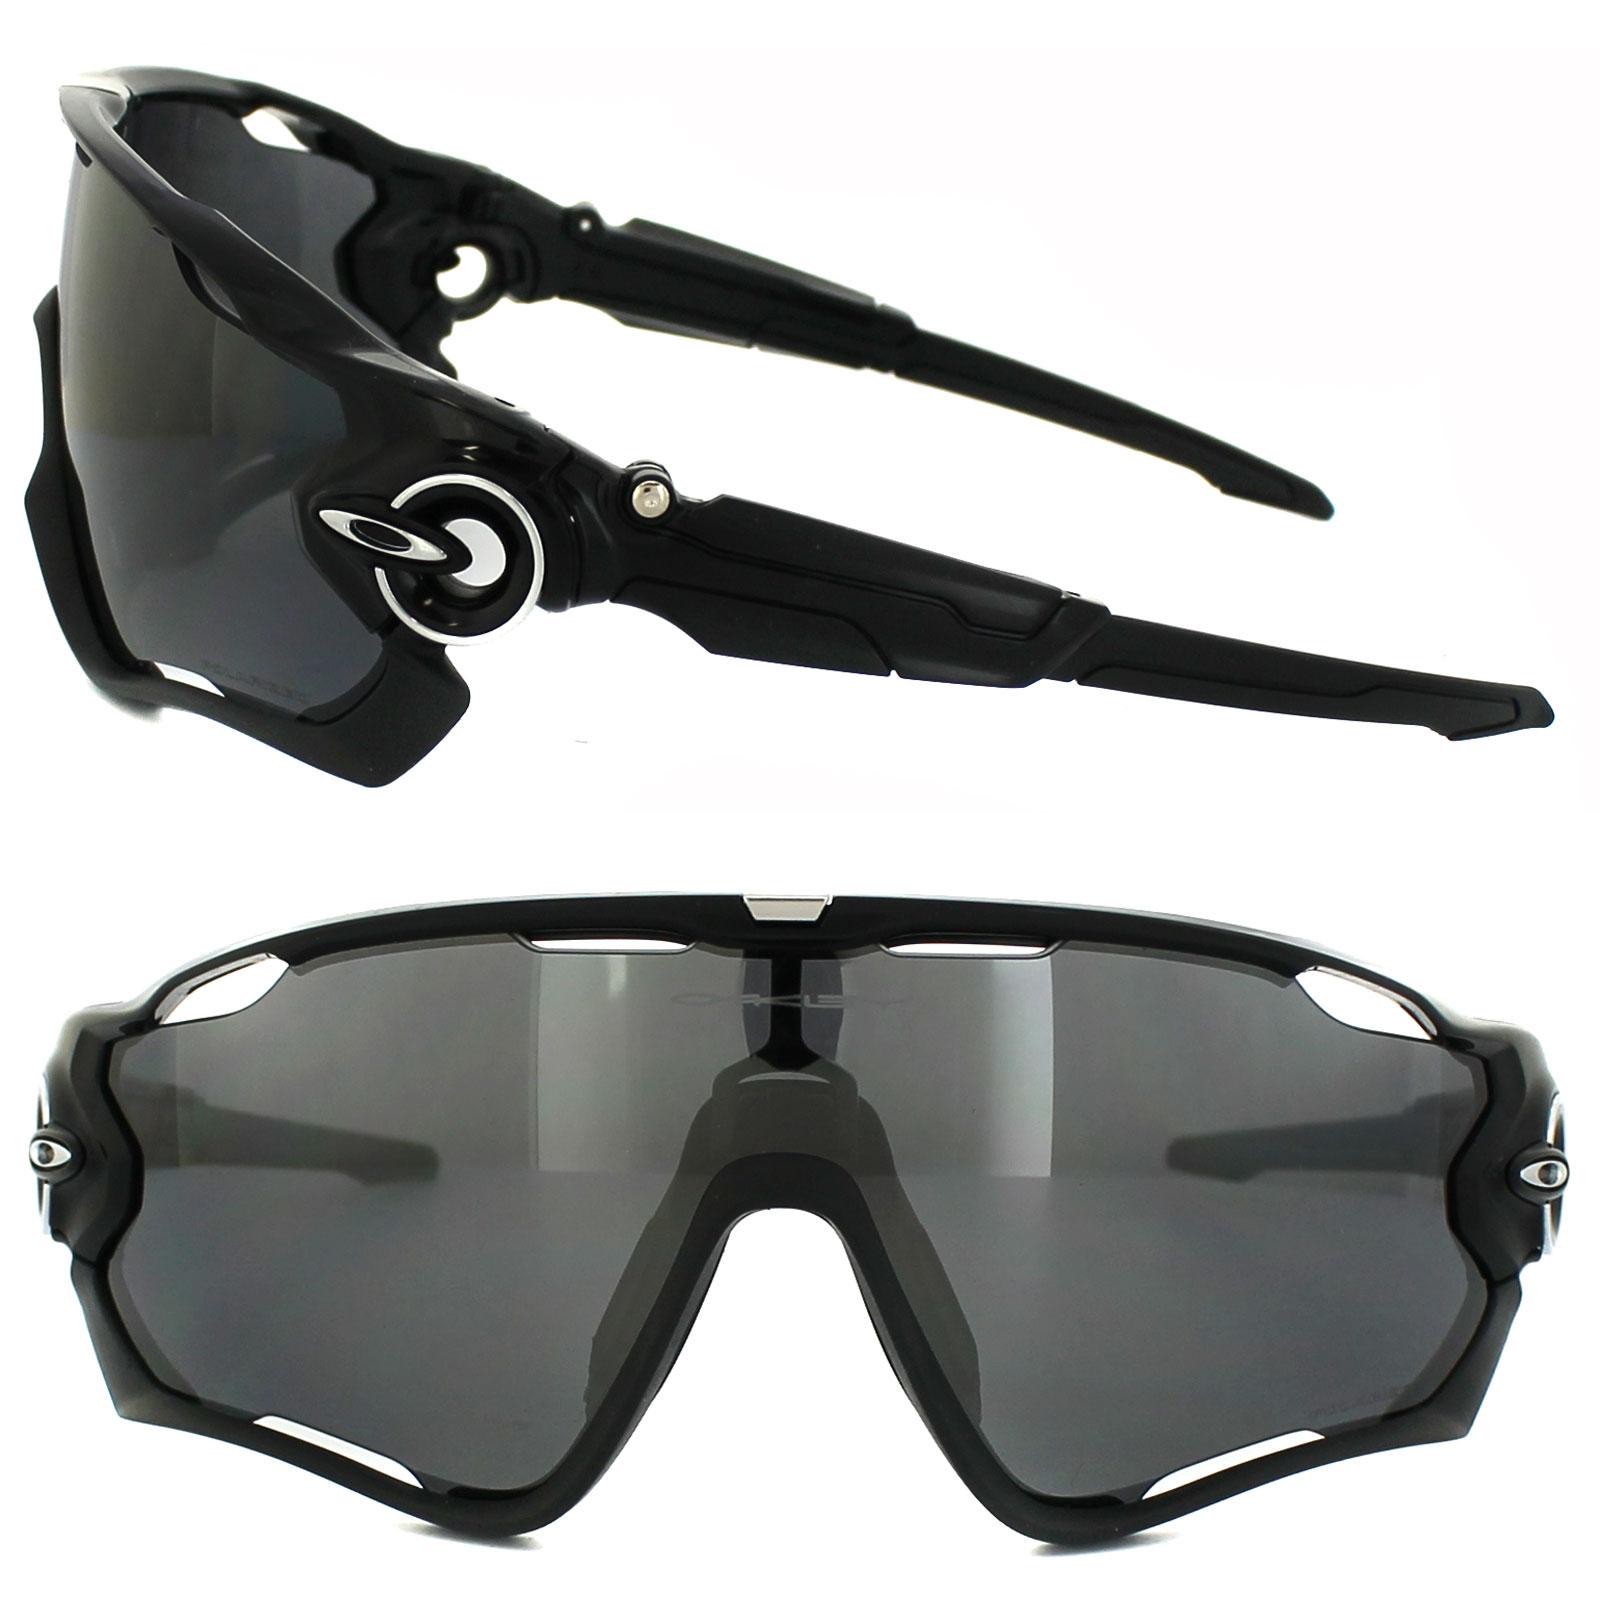 Cheap Oakley Jawbreaker Sunglasses Discounted Sunglasses